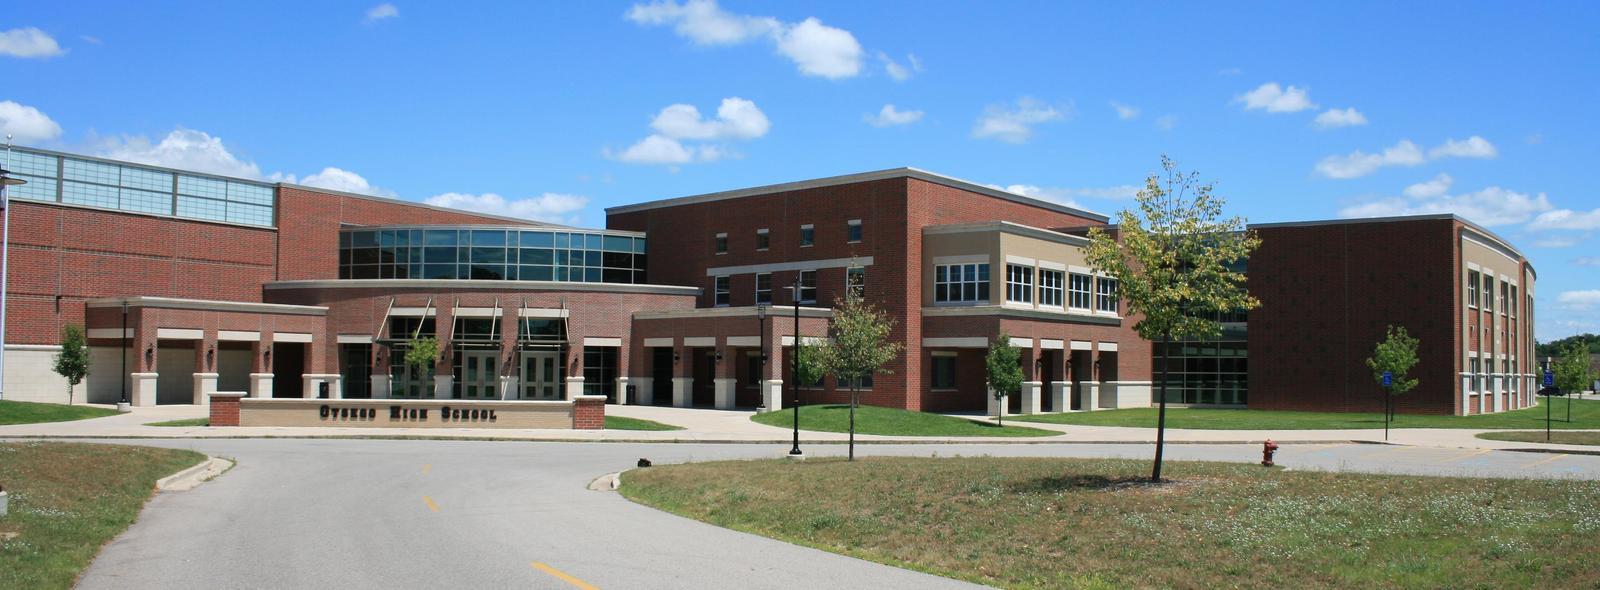 Exterior shot of the high school.